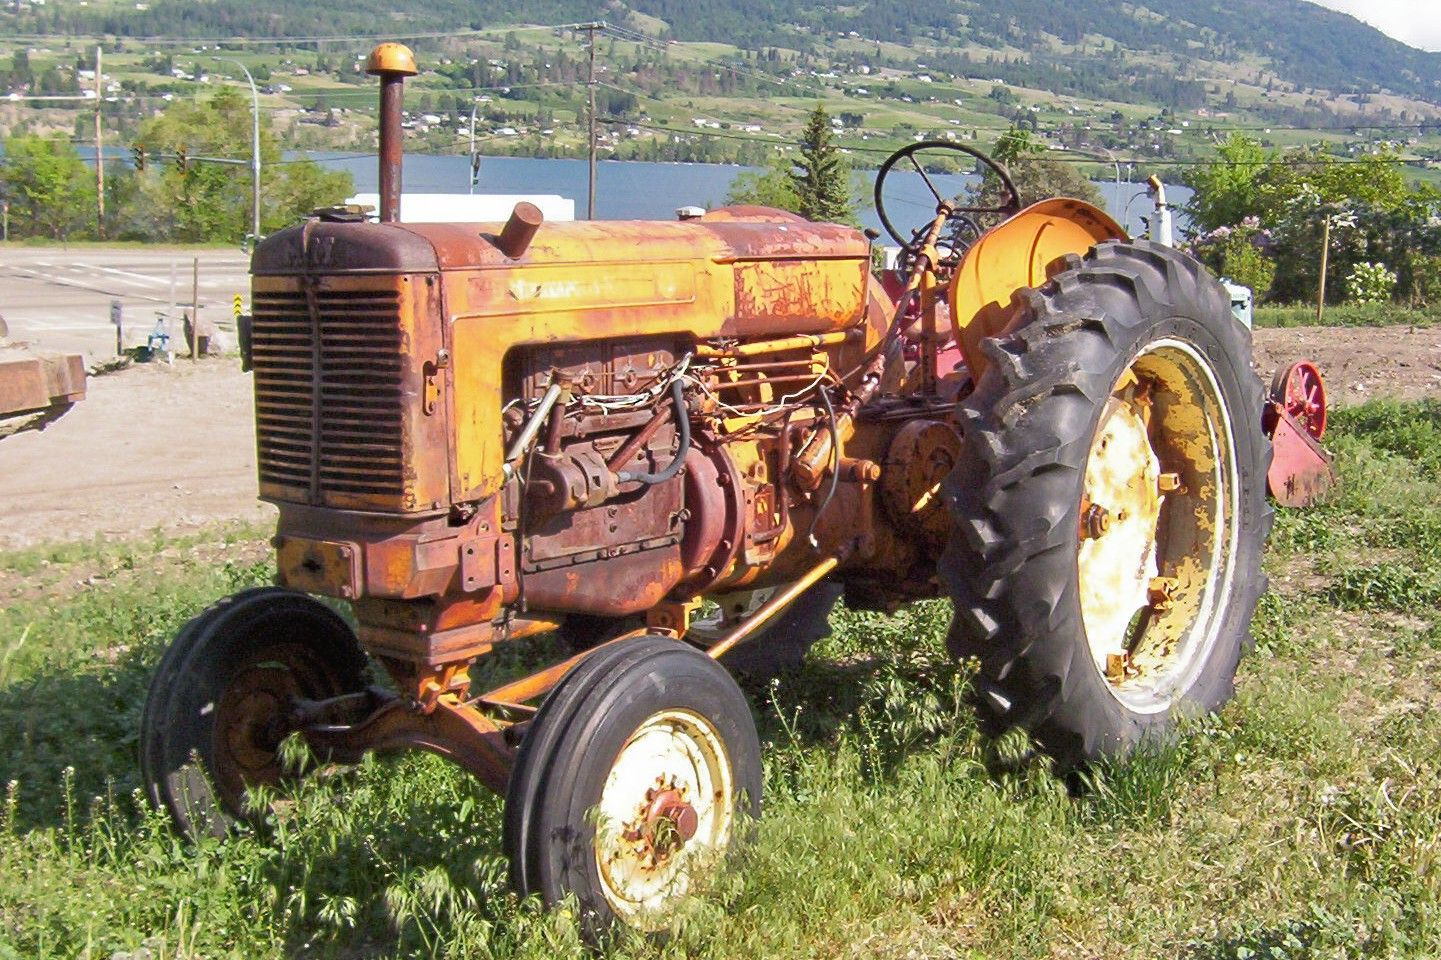 Antique Tractors Equipment : Image detail for antique tractor photos page tractors